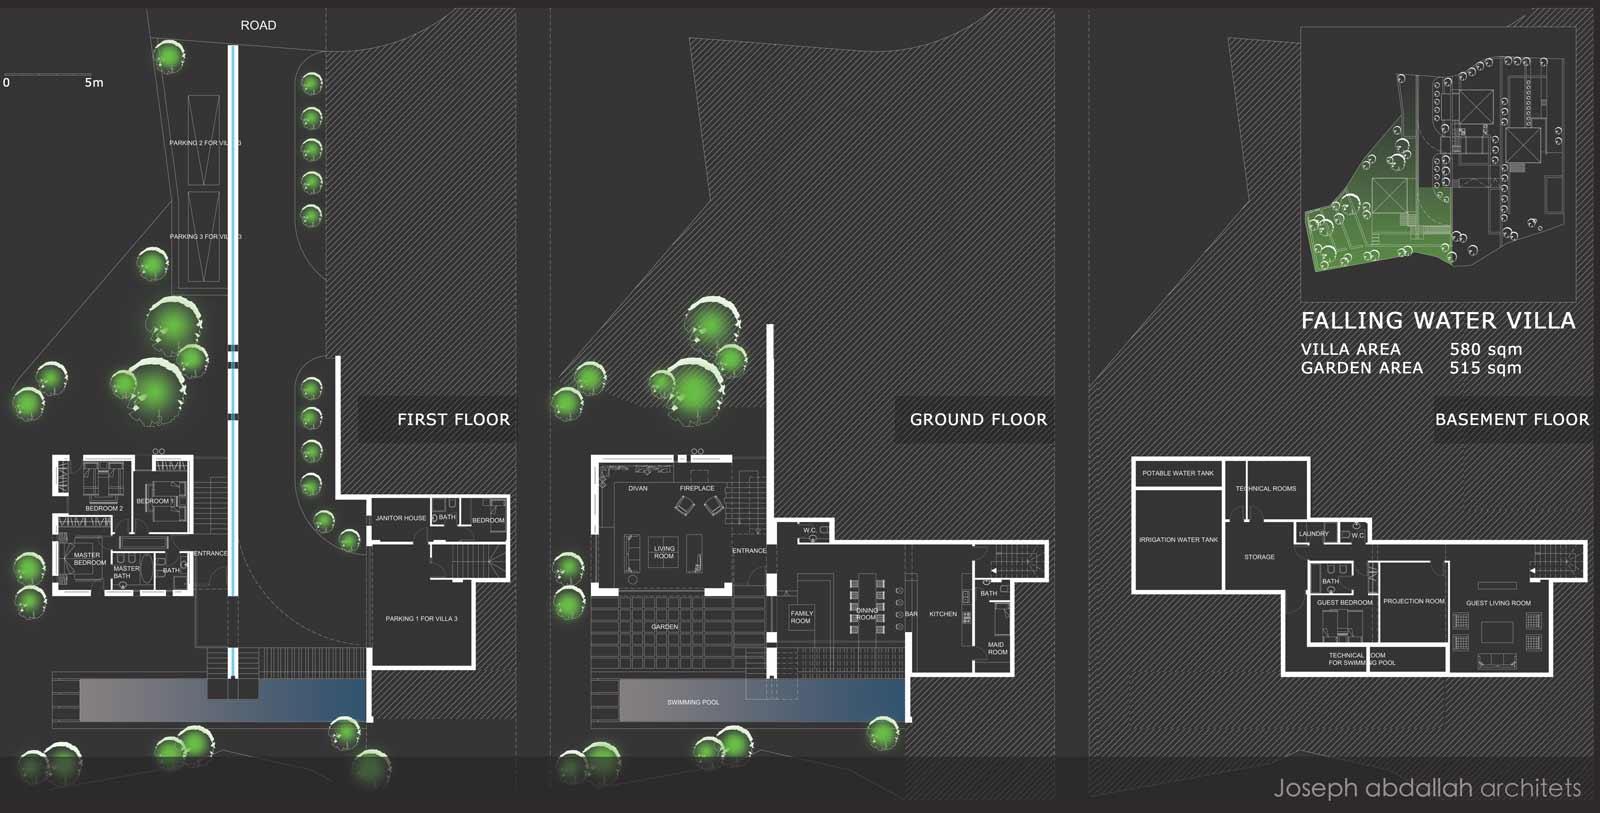 domaine-du-chene-lebanese-traditional-achitecture-joseph-abdallah-architects-villa3p